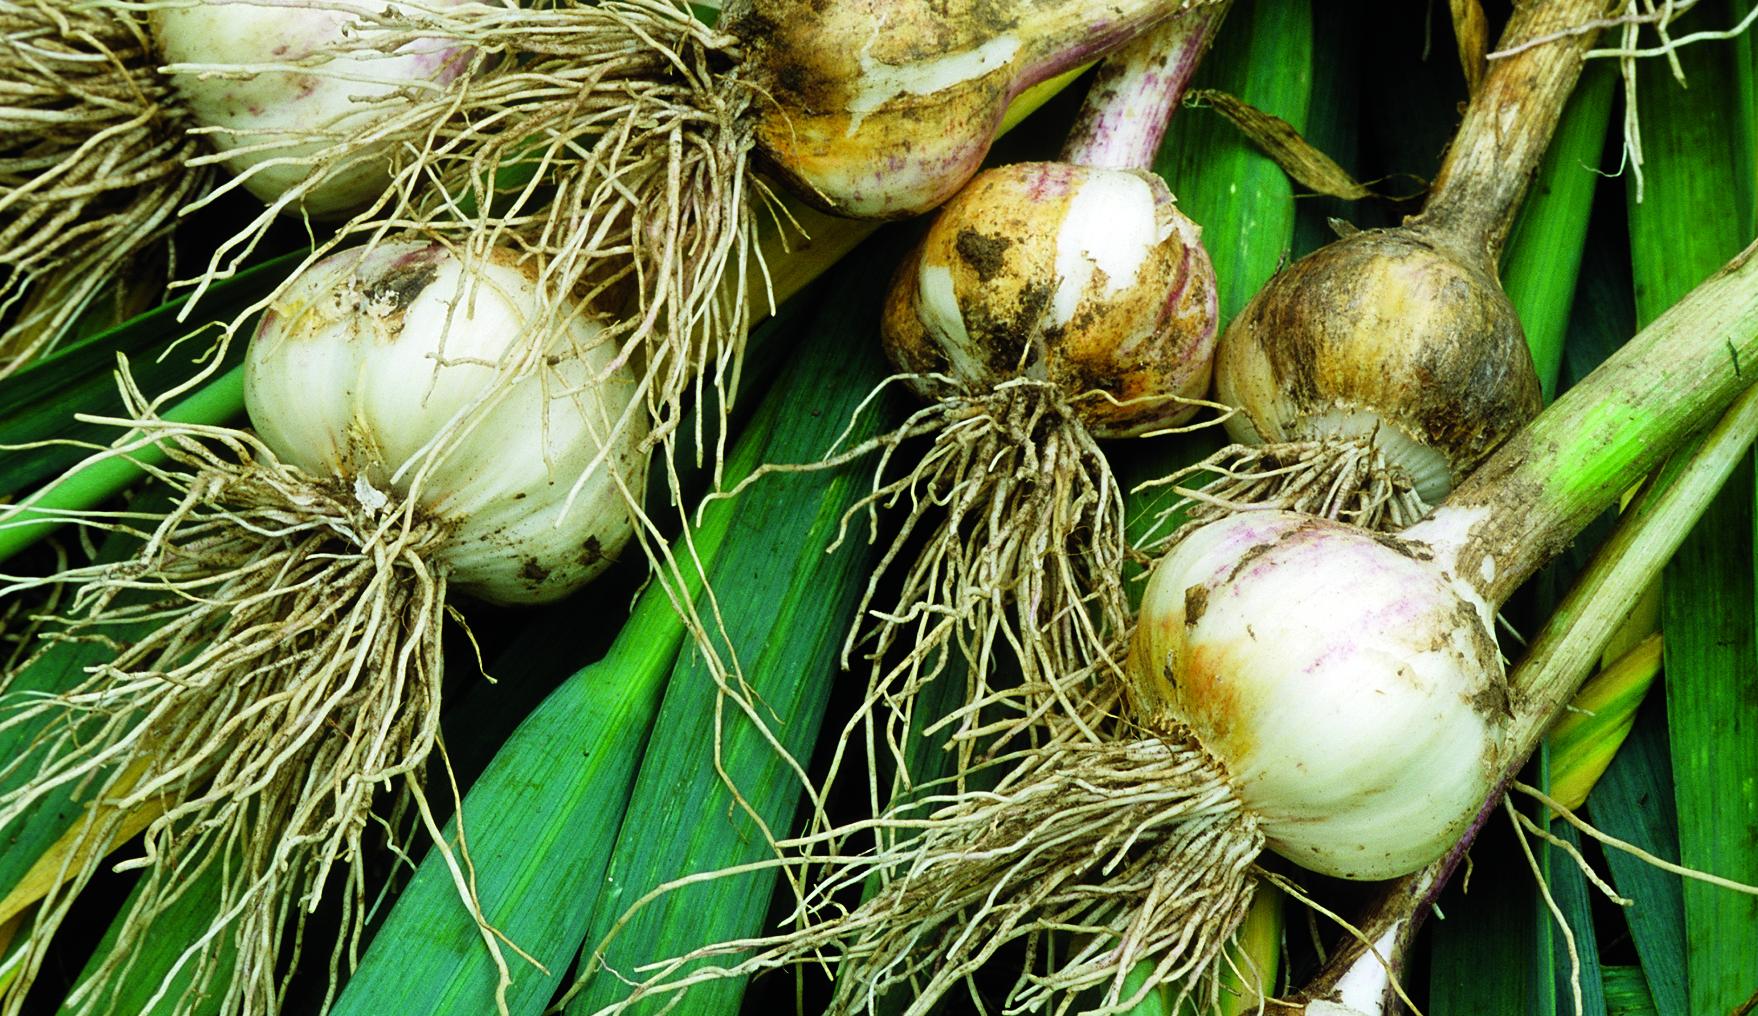 Garlic, Garlic cloves, Garlic bulbs, Fresh Garlic, Braided Garlic, Fields of Garlic, Garlic Drying, Allium sativum, Da-suan